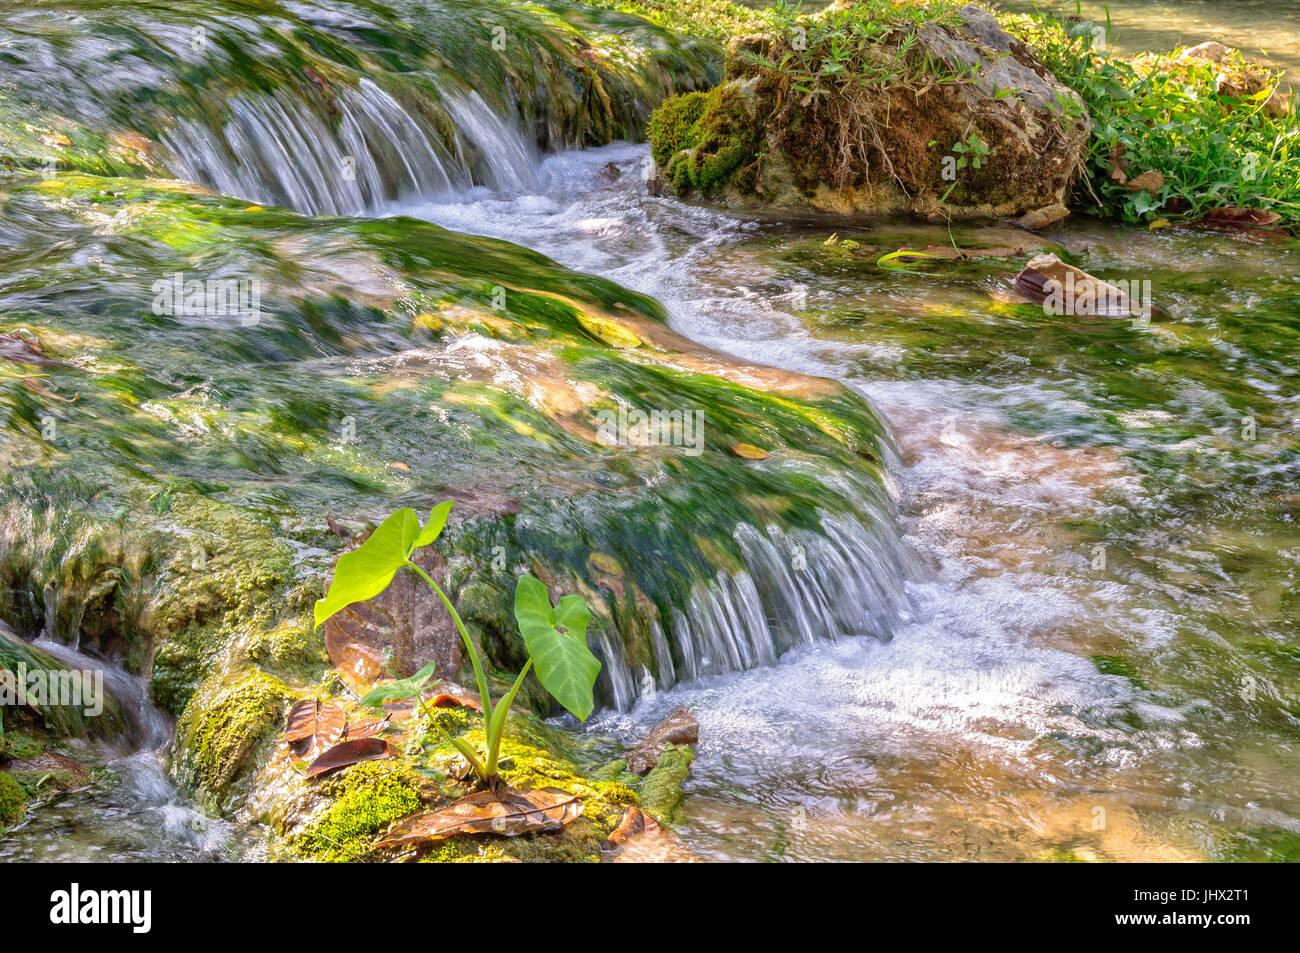 Crystal clear water of Mele Creek - Port Vila, Efate Island, Vanuatu - Stock Image